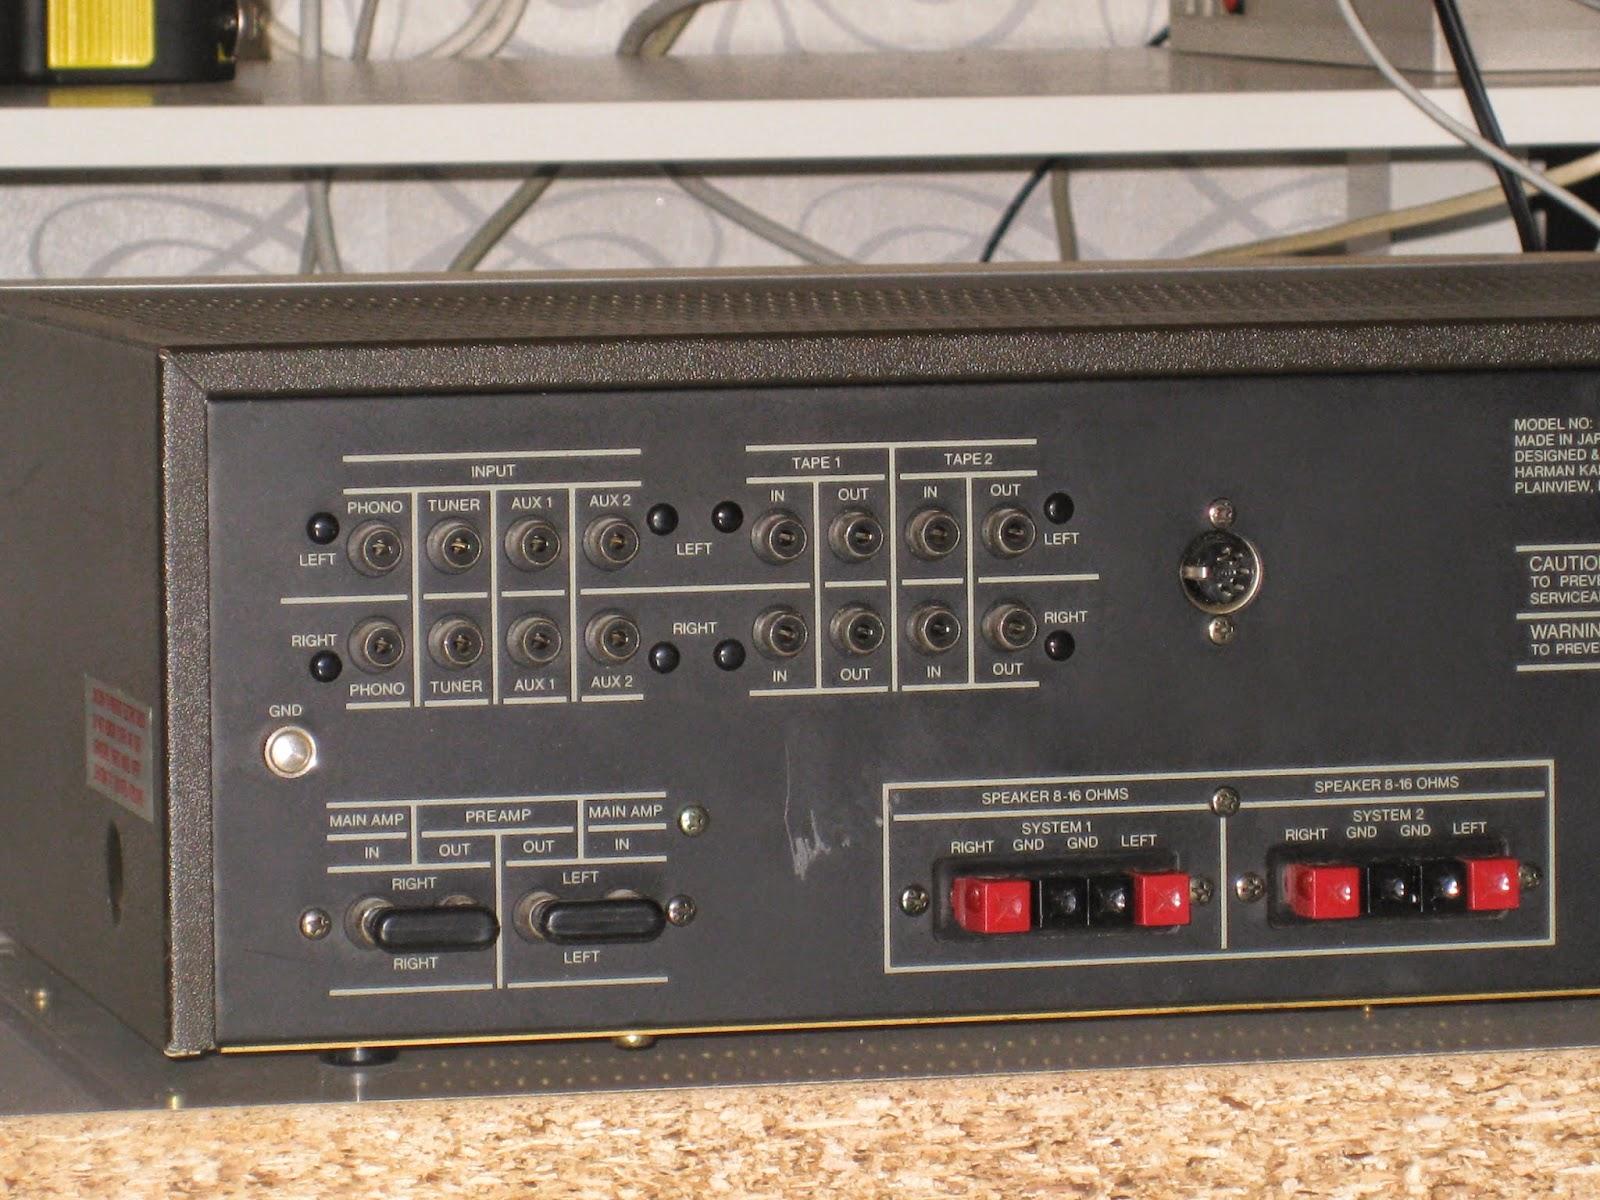 Infrequent Sound Sextex Technology Harman Kardon Hk 505 Twin Dc Coupled Audio Amplifier Powered Ultra Wideband Integrated